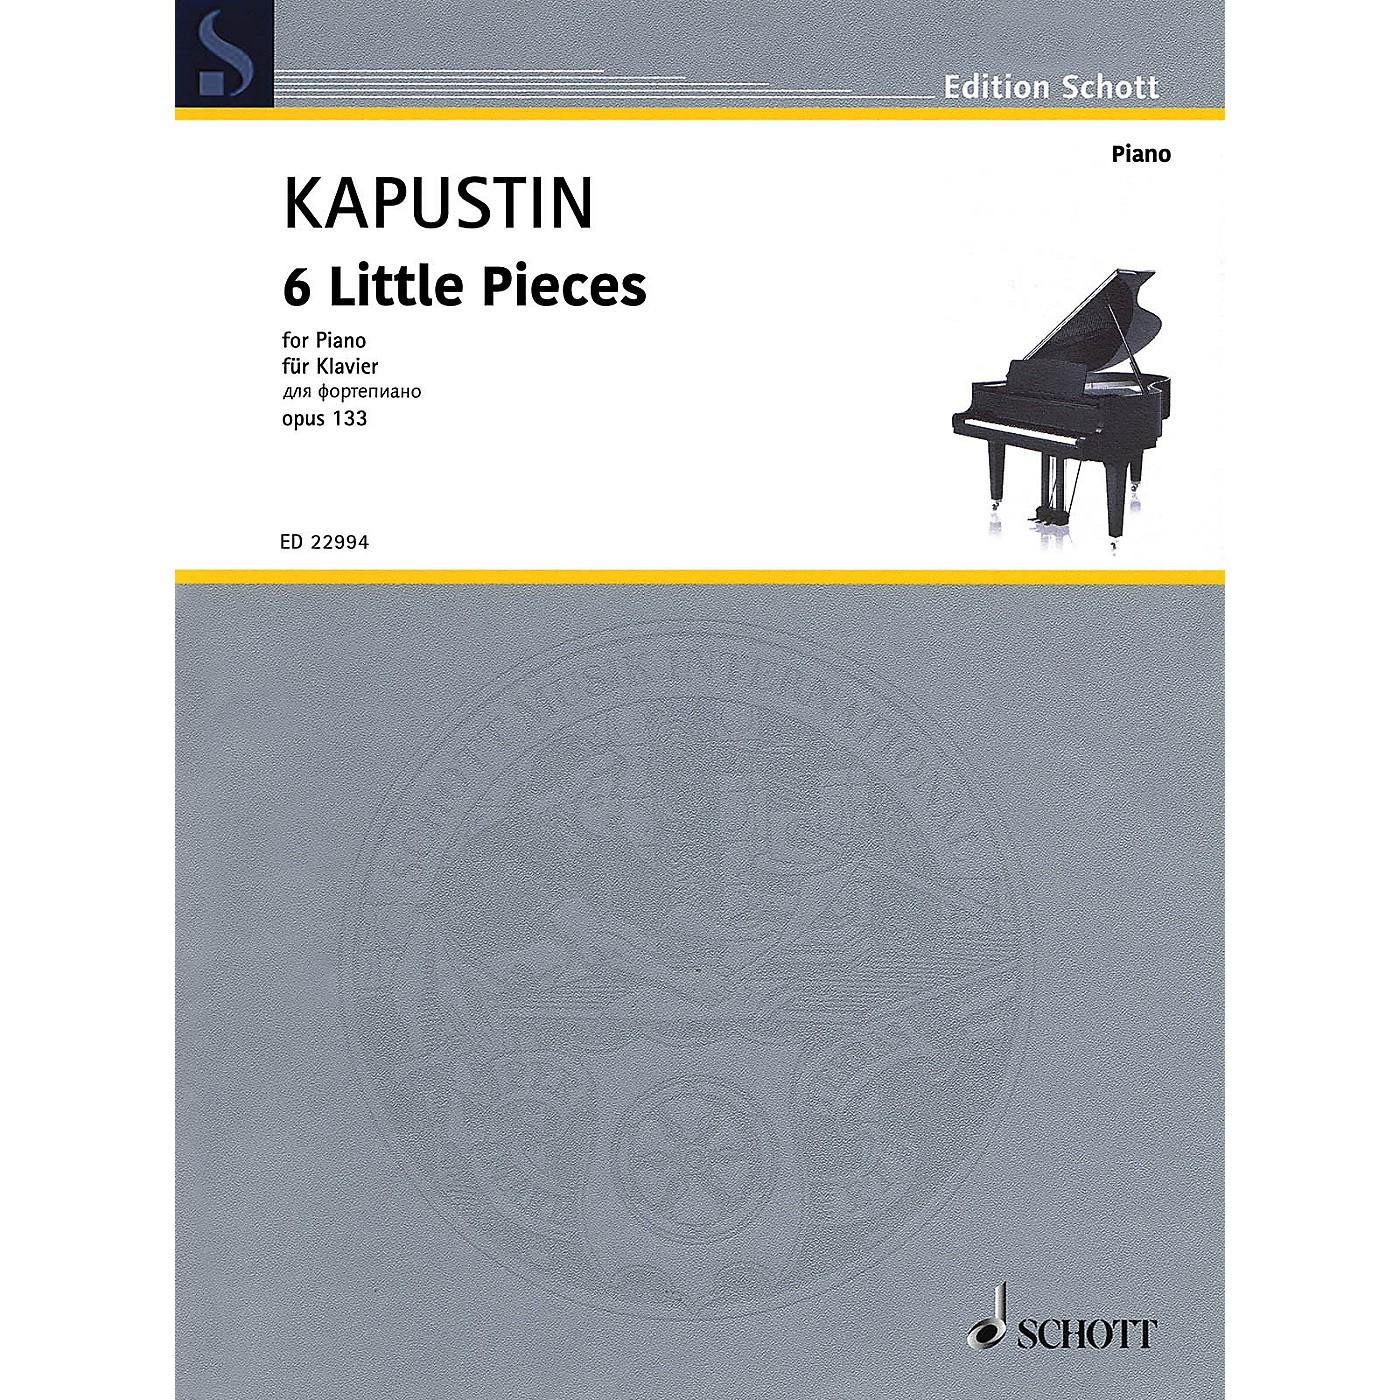 Schott 6 Little Pieces, Op. 133 Piano Solo by Kapustin thumbnail